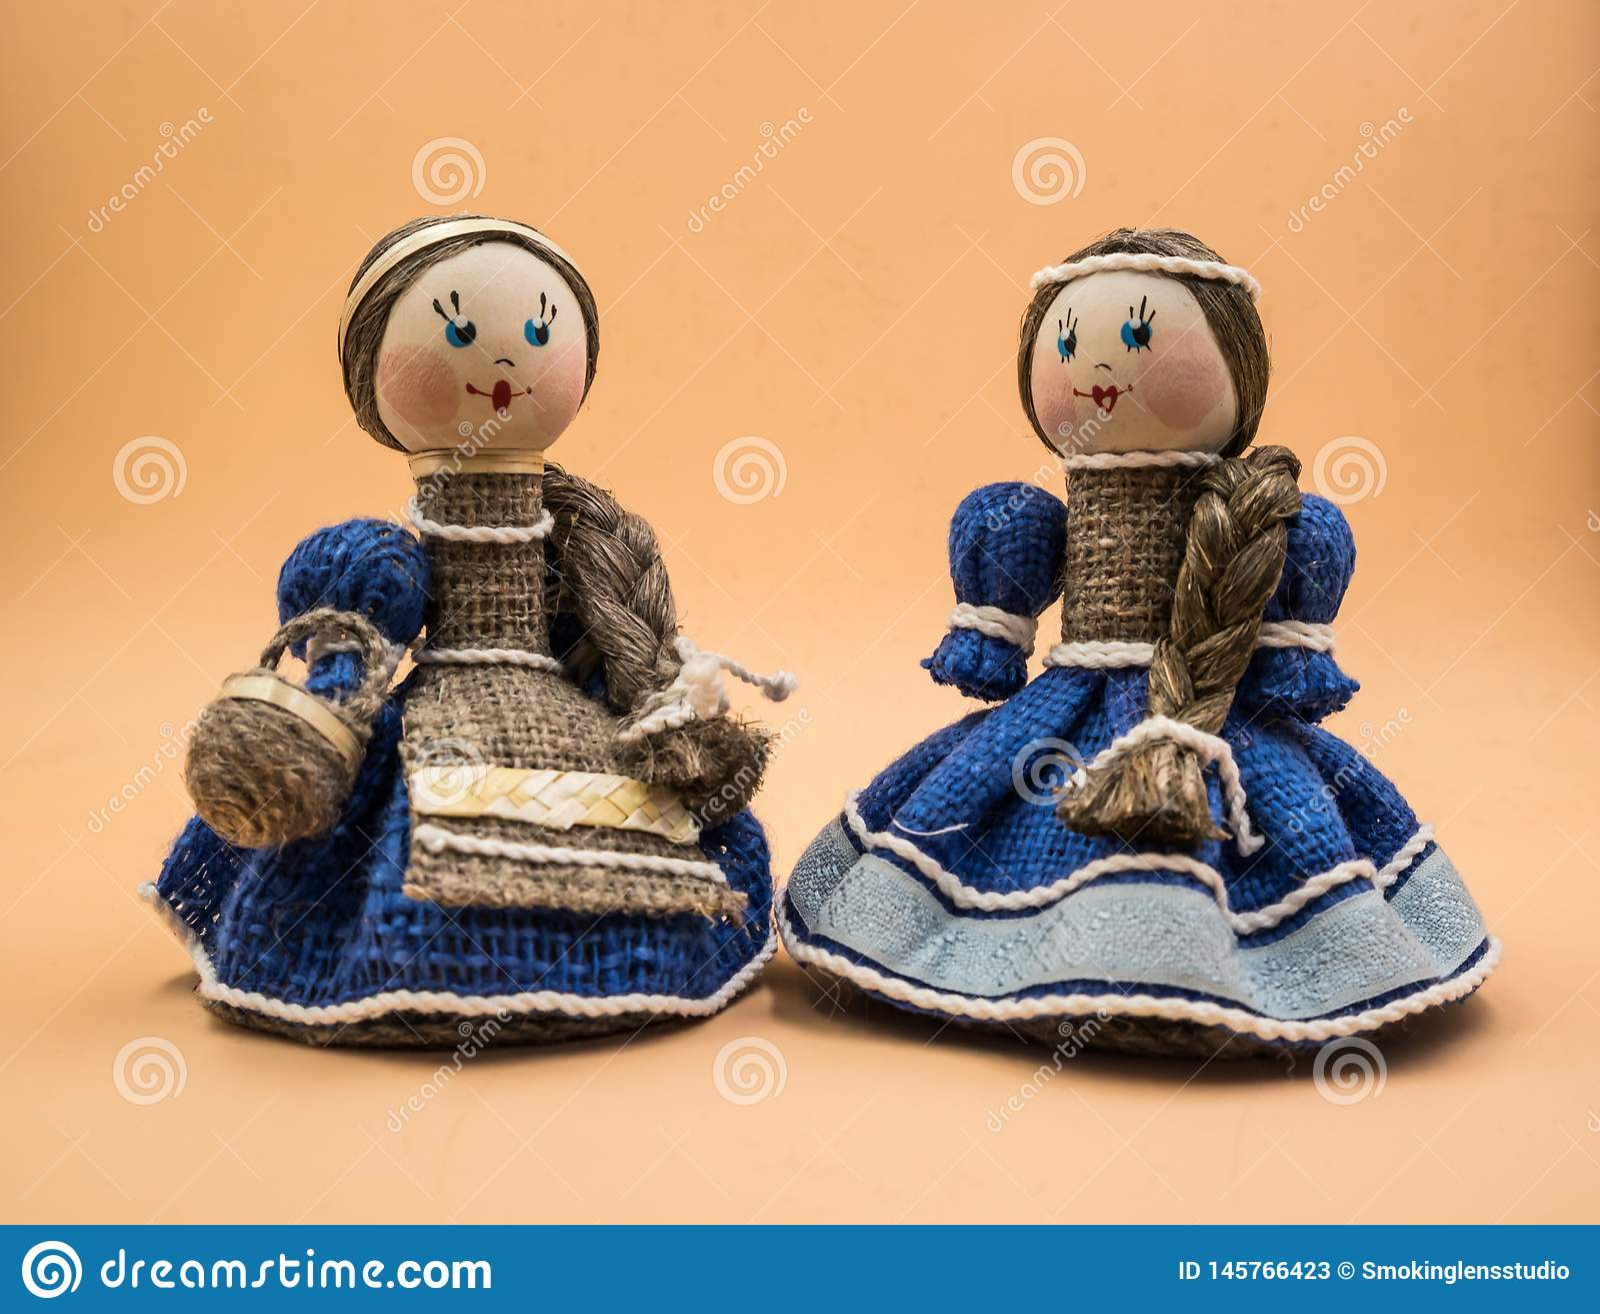 Bellarusian玩偶,玩具